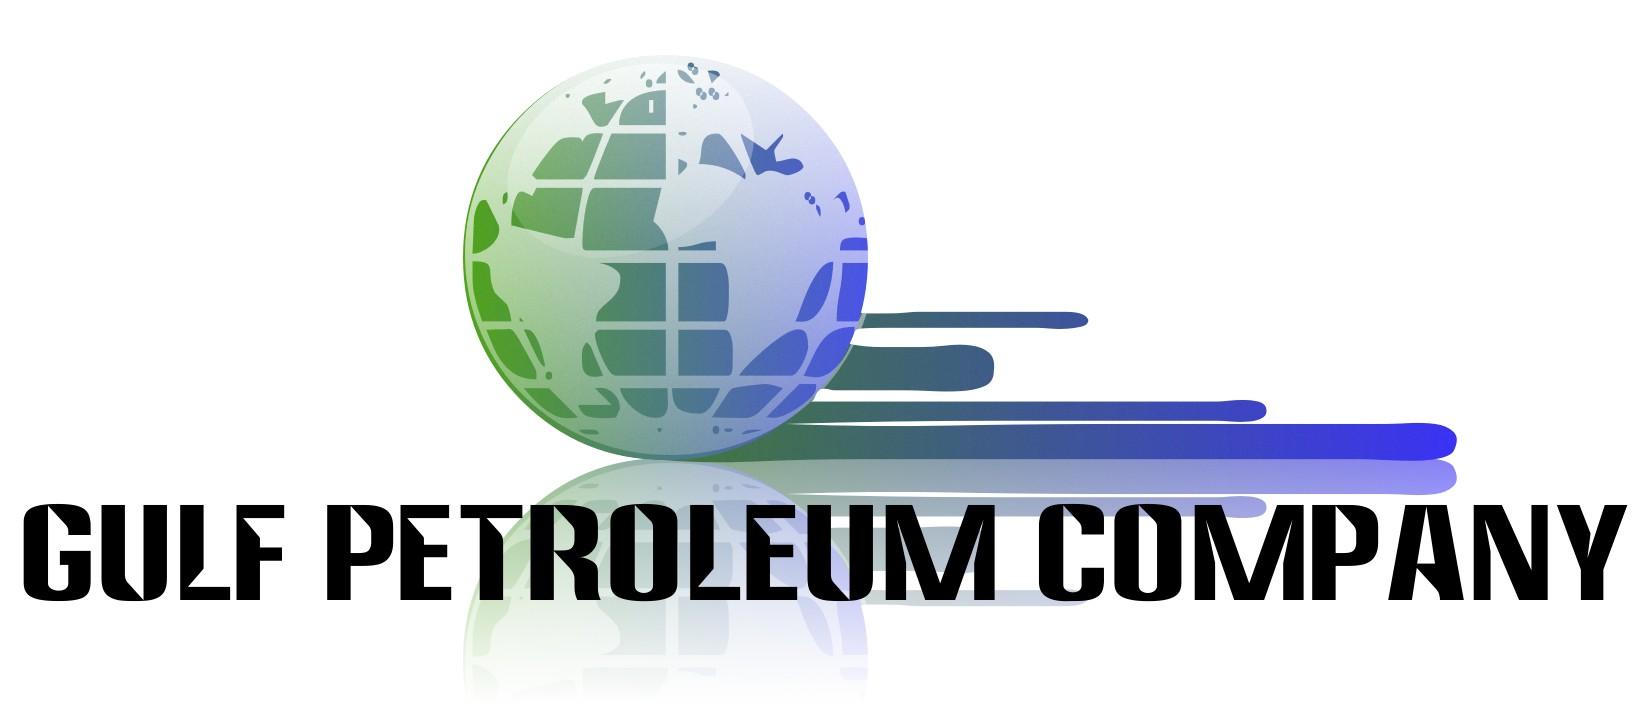 Gulf Petroleum Company,ltd logo